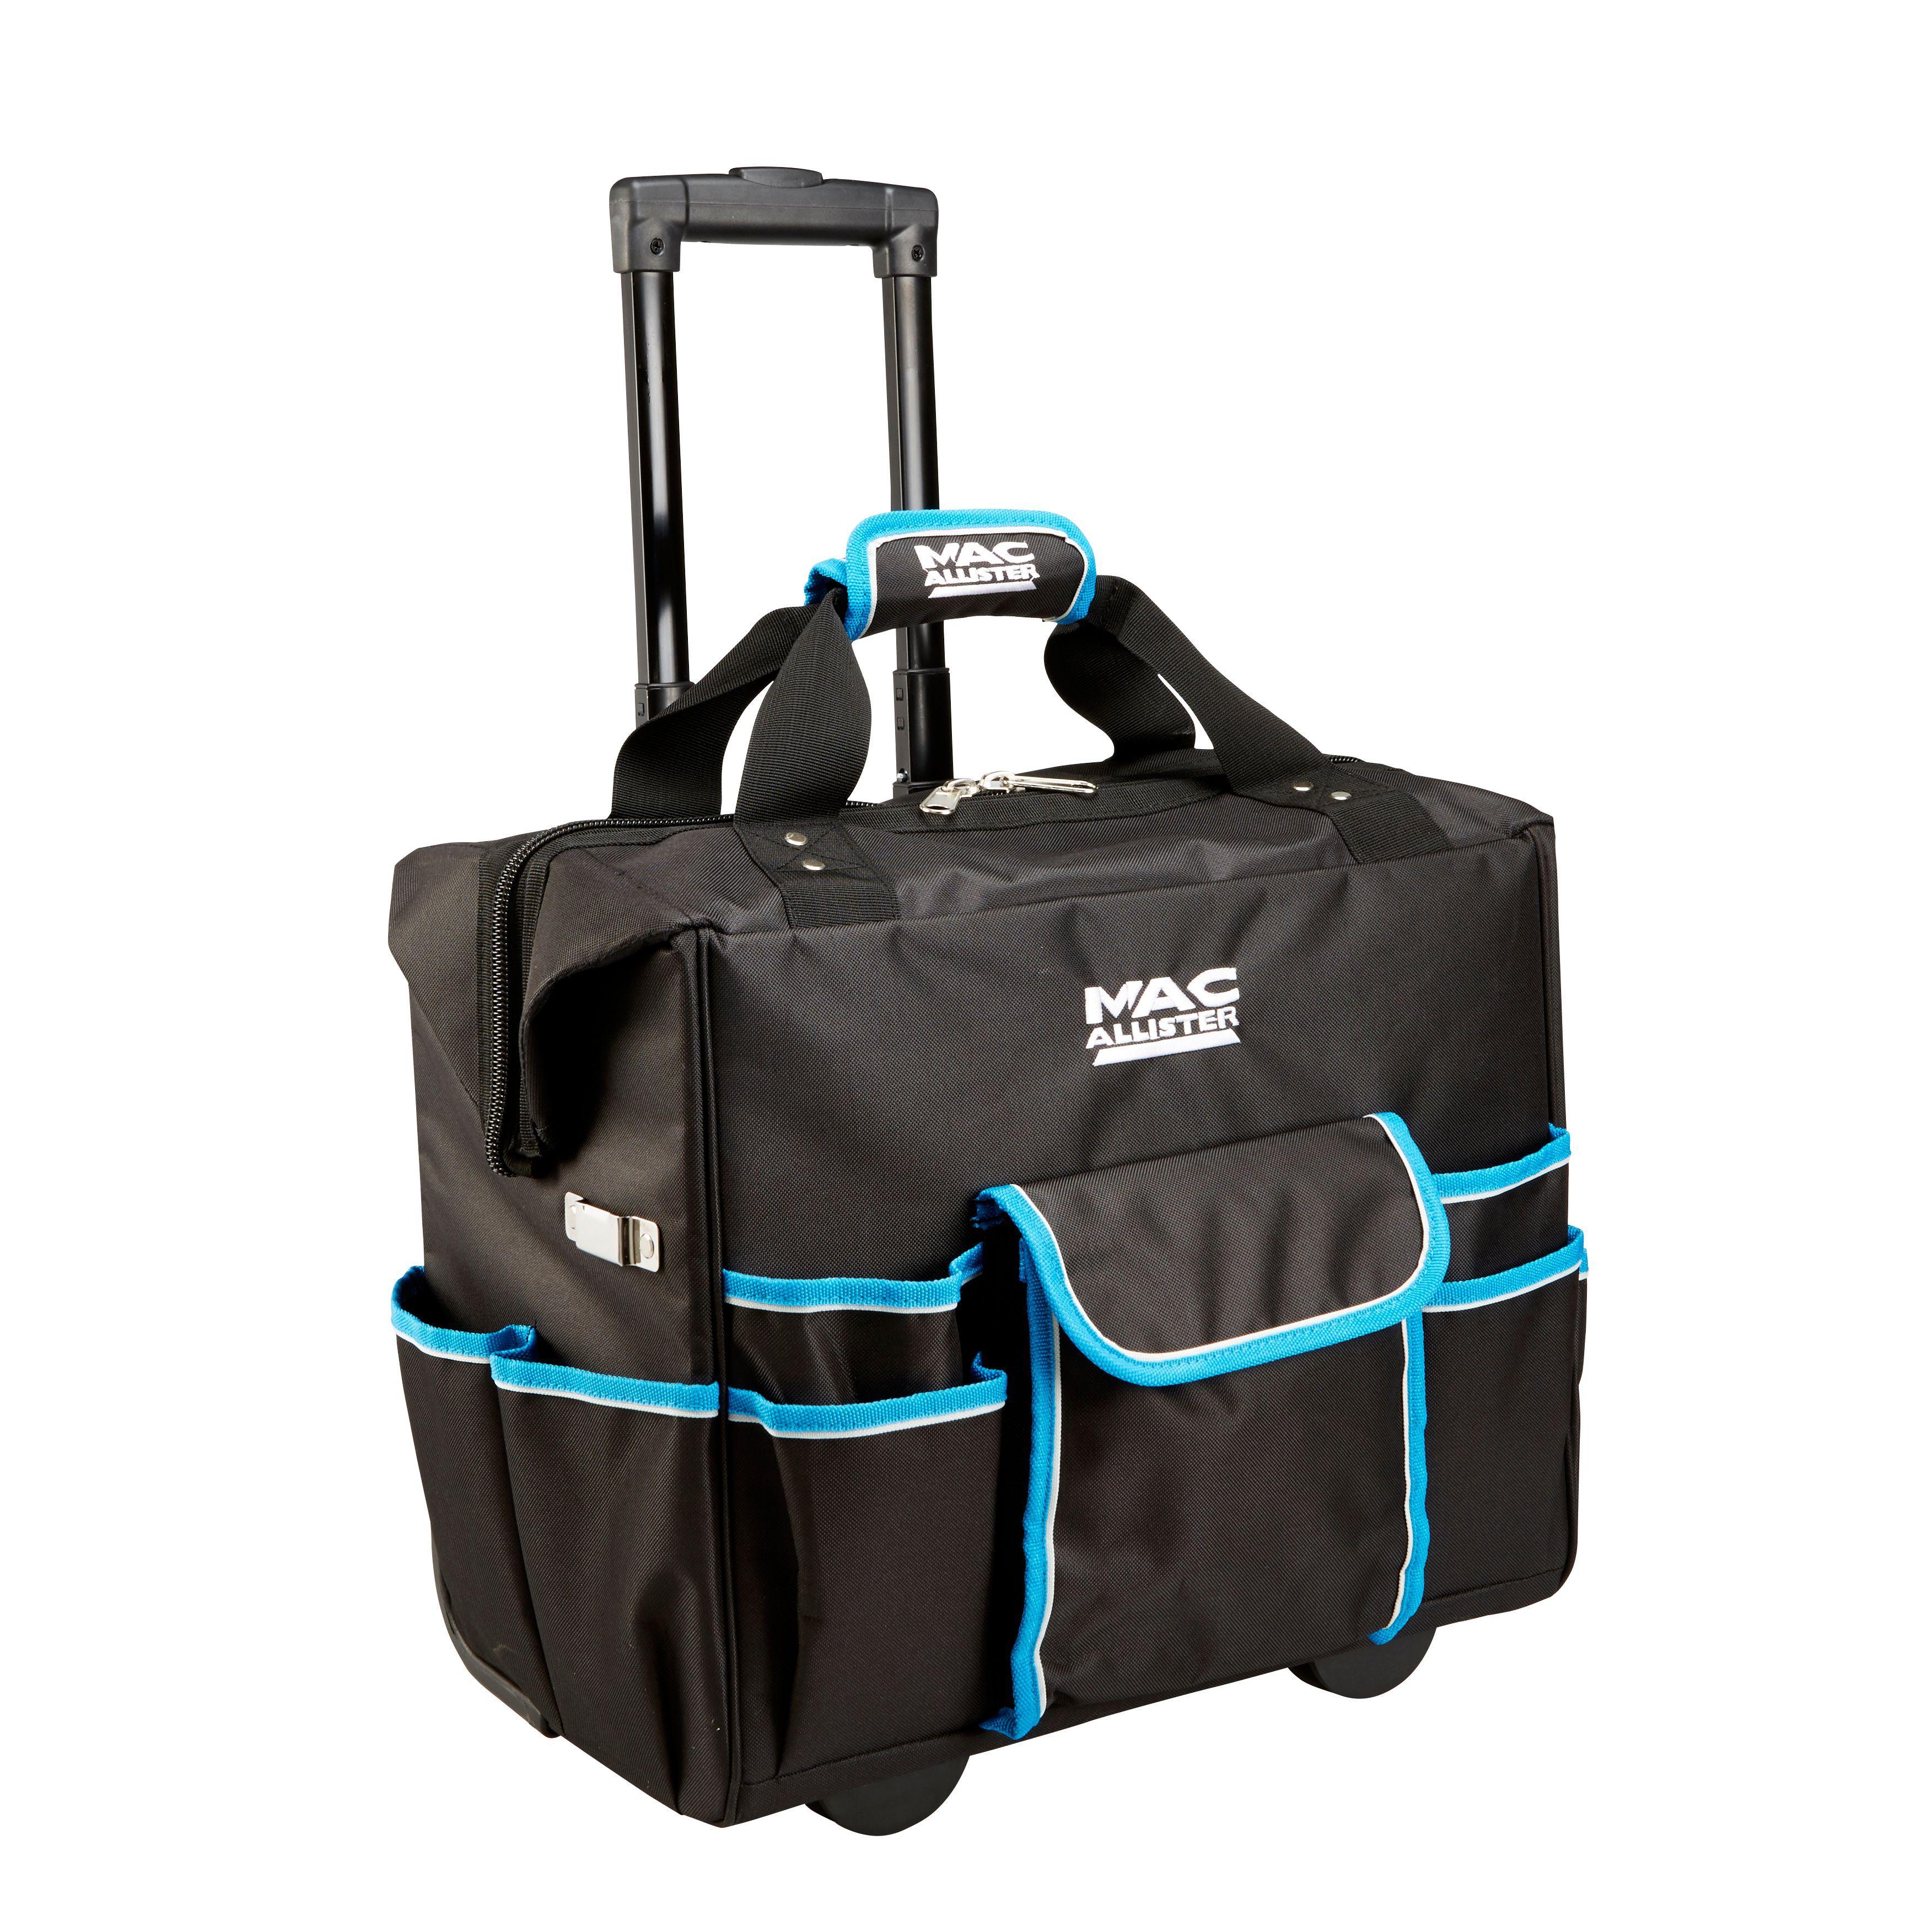 Mac Allister 600d Tool Bag With Wheels H 380mm W 260mm